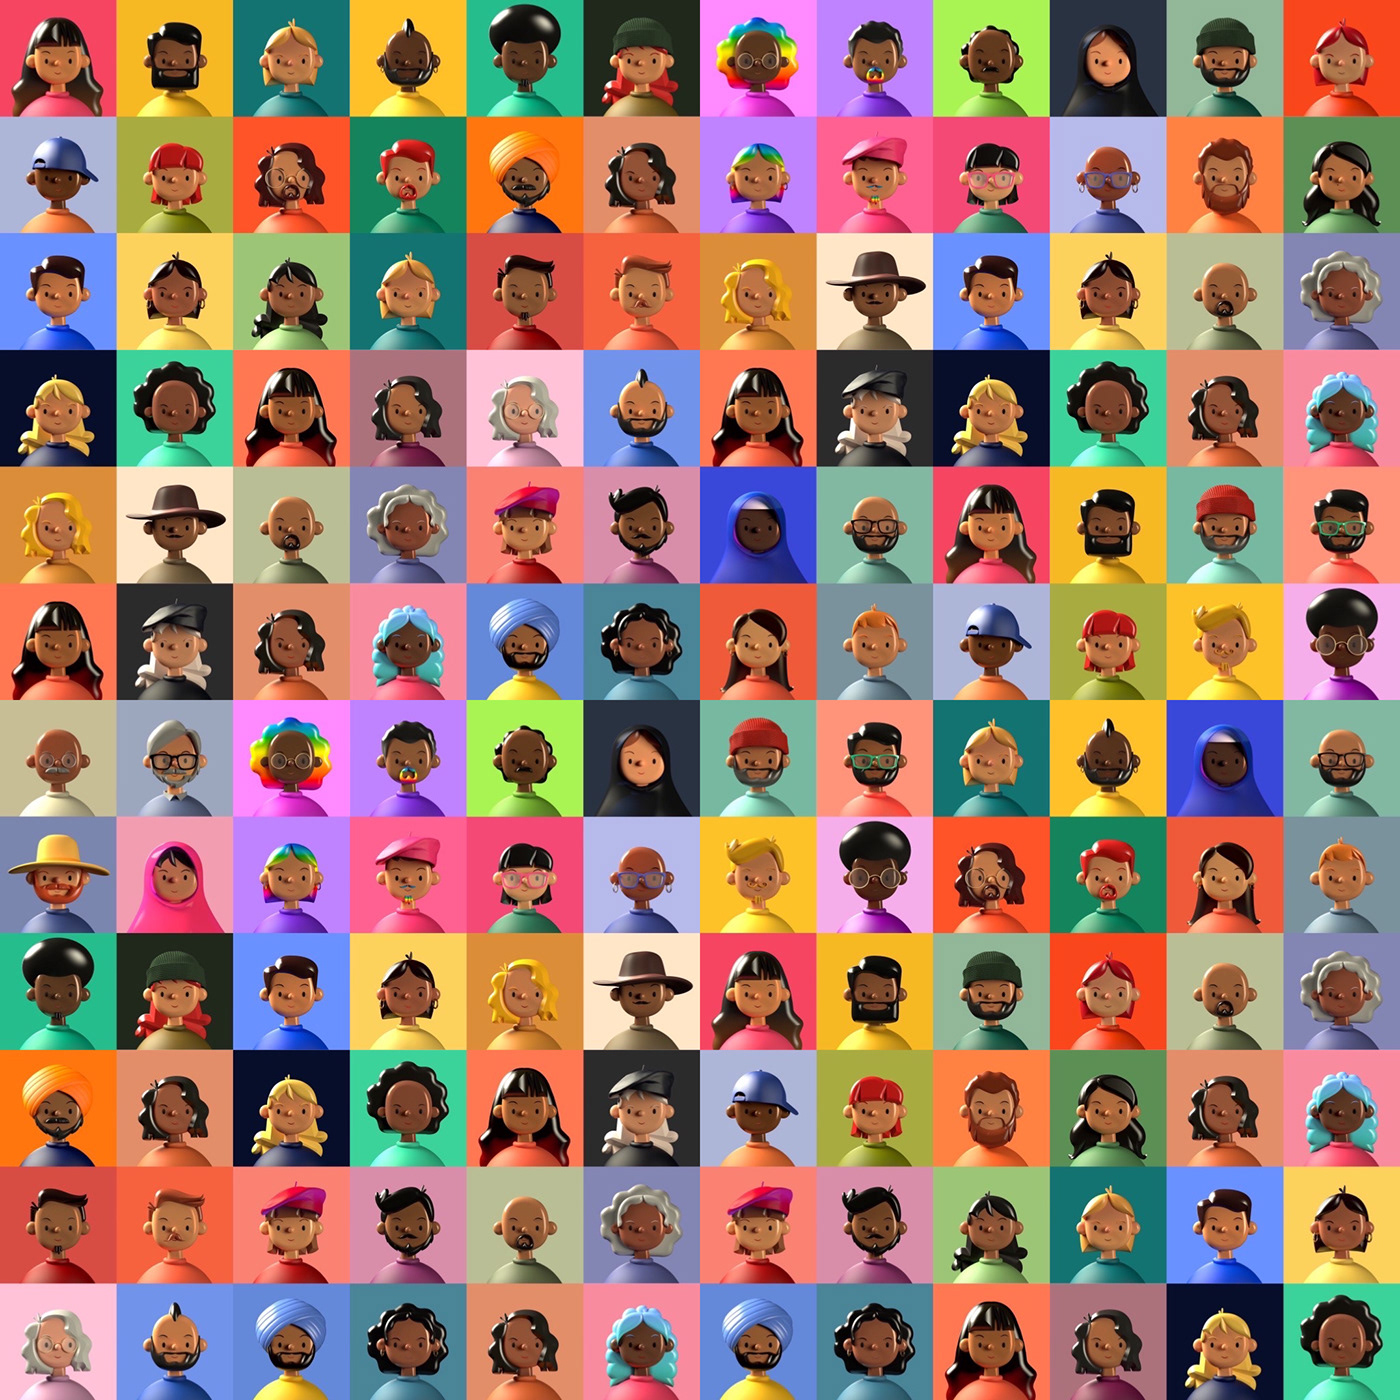 3D avatar c4d Character diverse Emoji free pride profile redshift